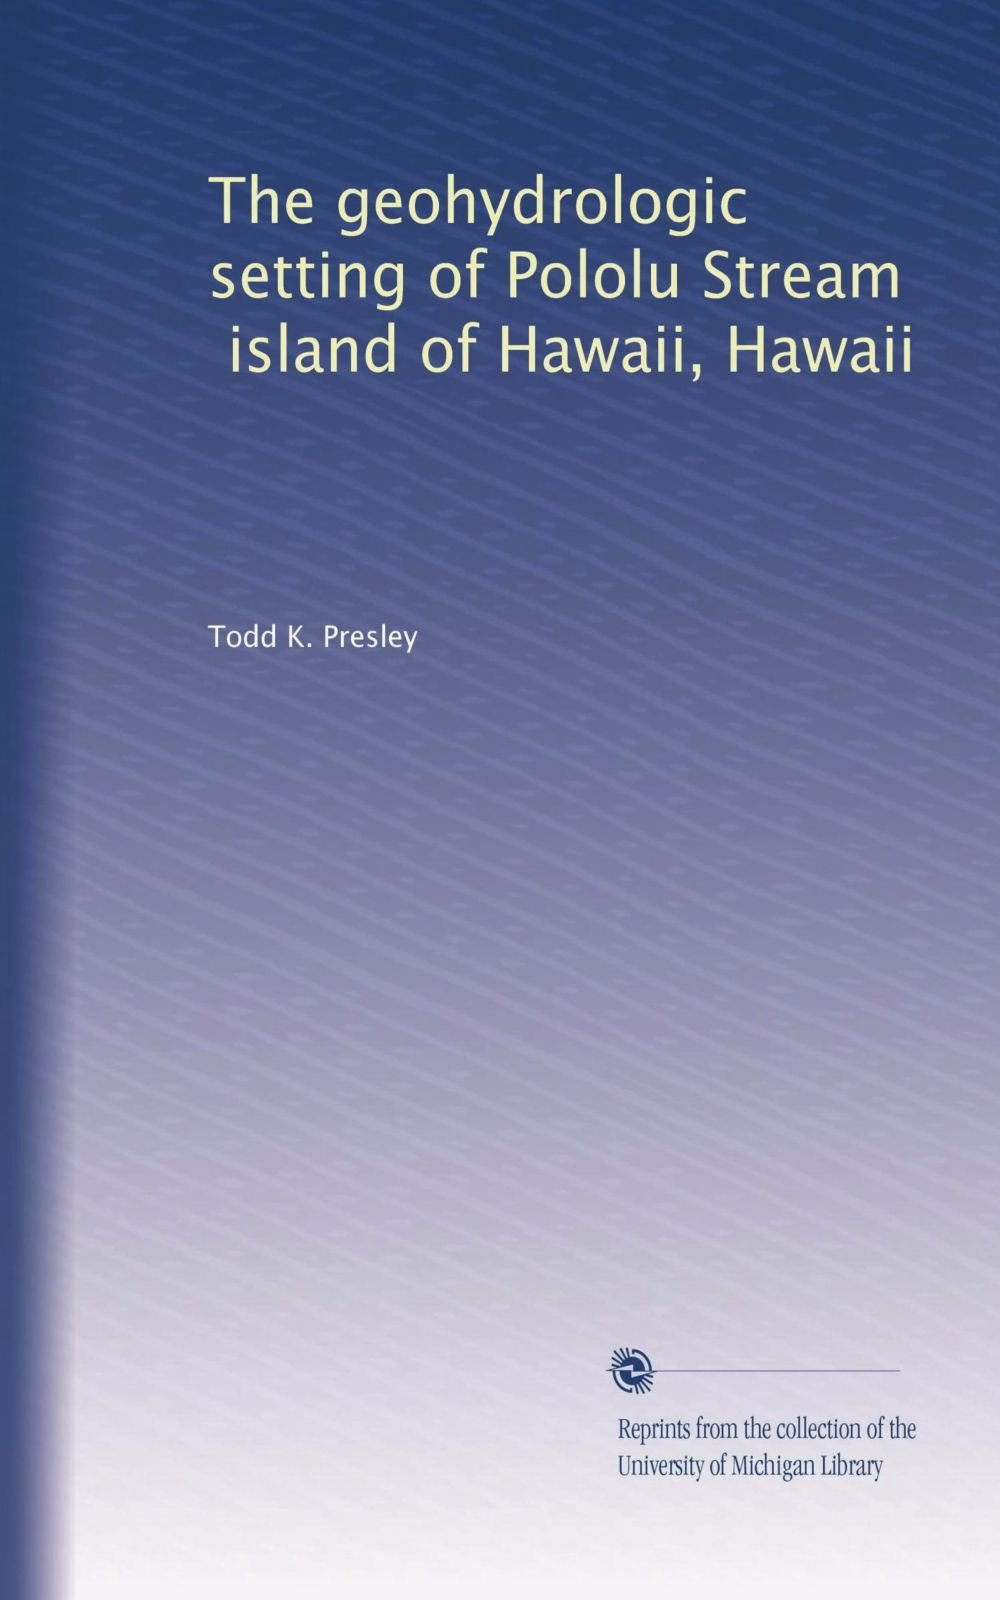 The geohydrologic setting of Pololu Stream, island of Hawaii, Hawaii